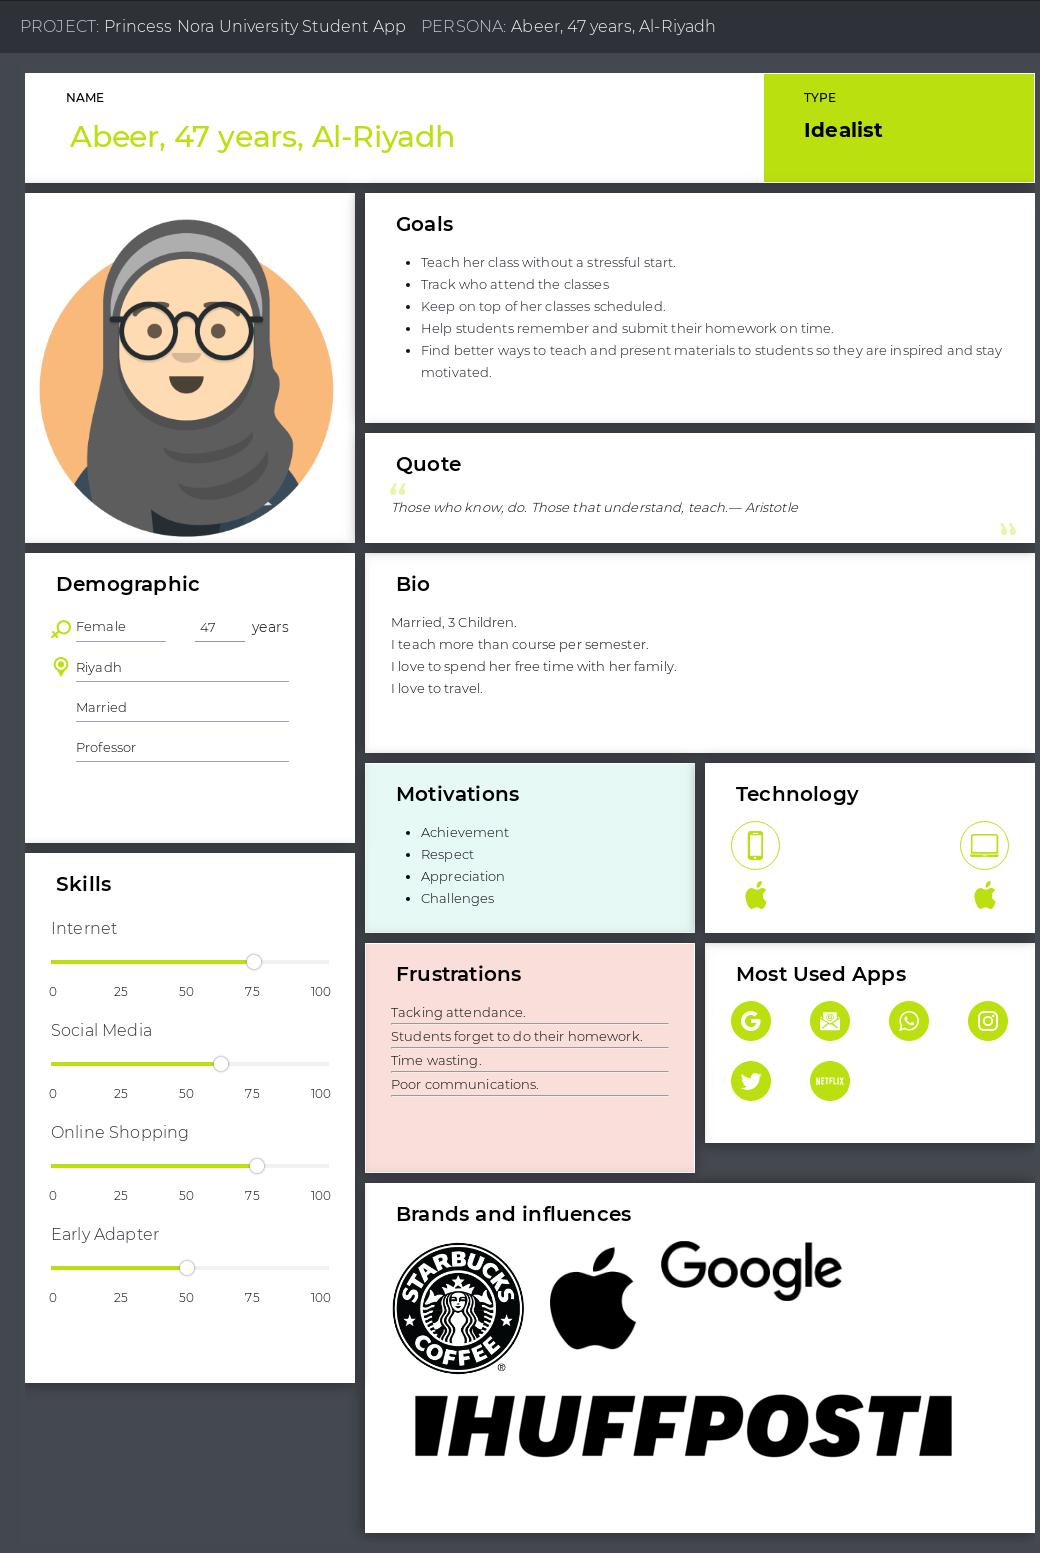 Nourah University Students App. - Pofessor Persona